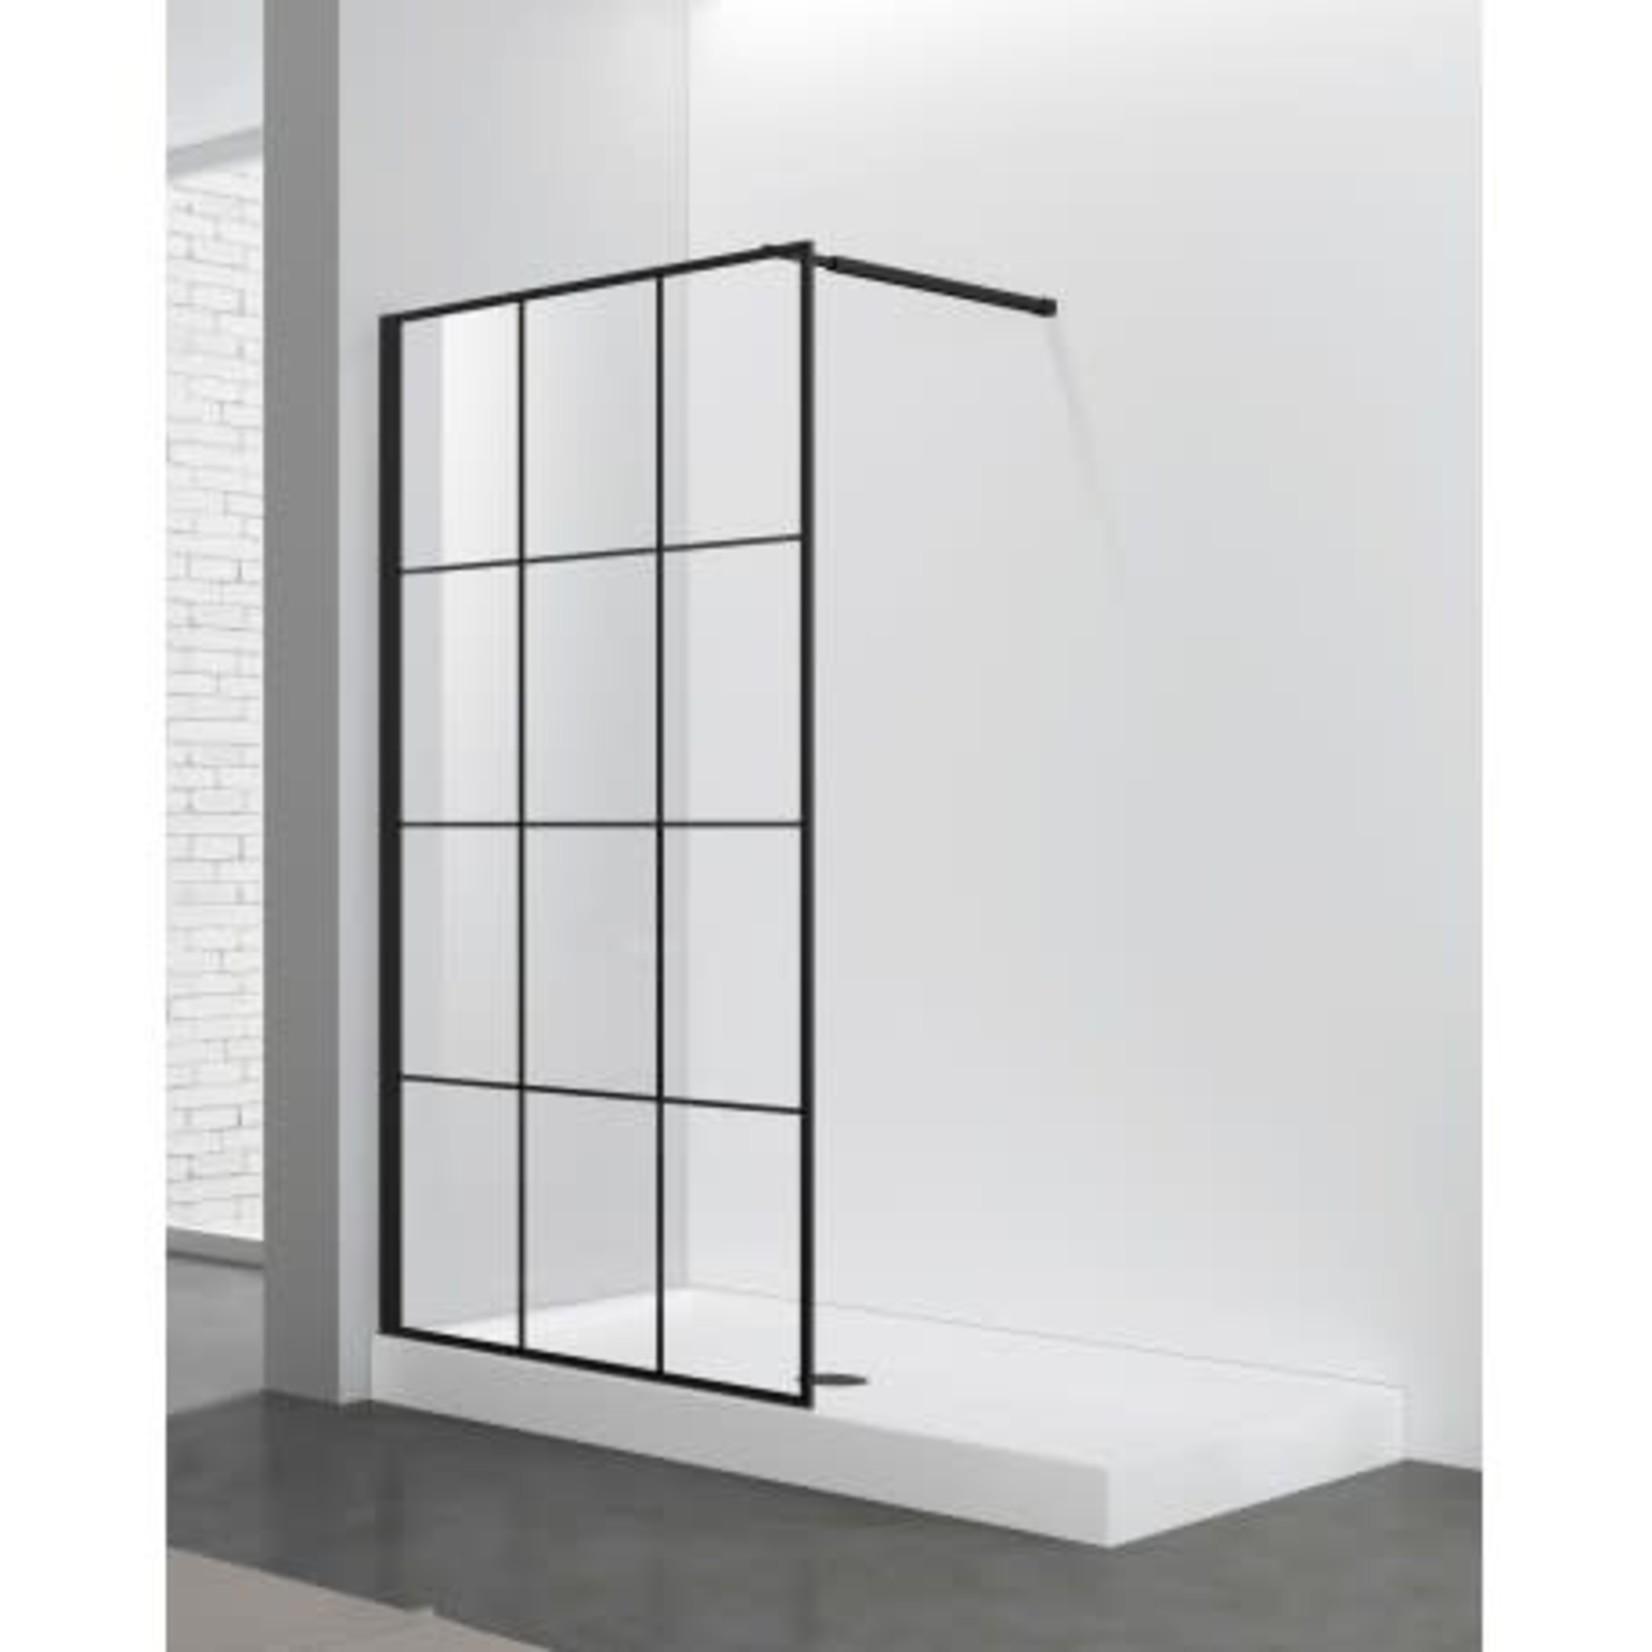 Syrius Italian style glass shower